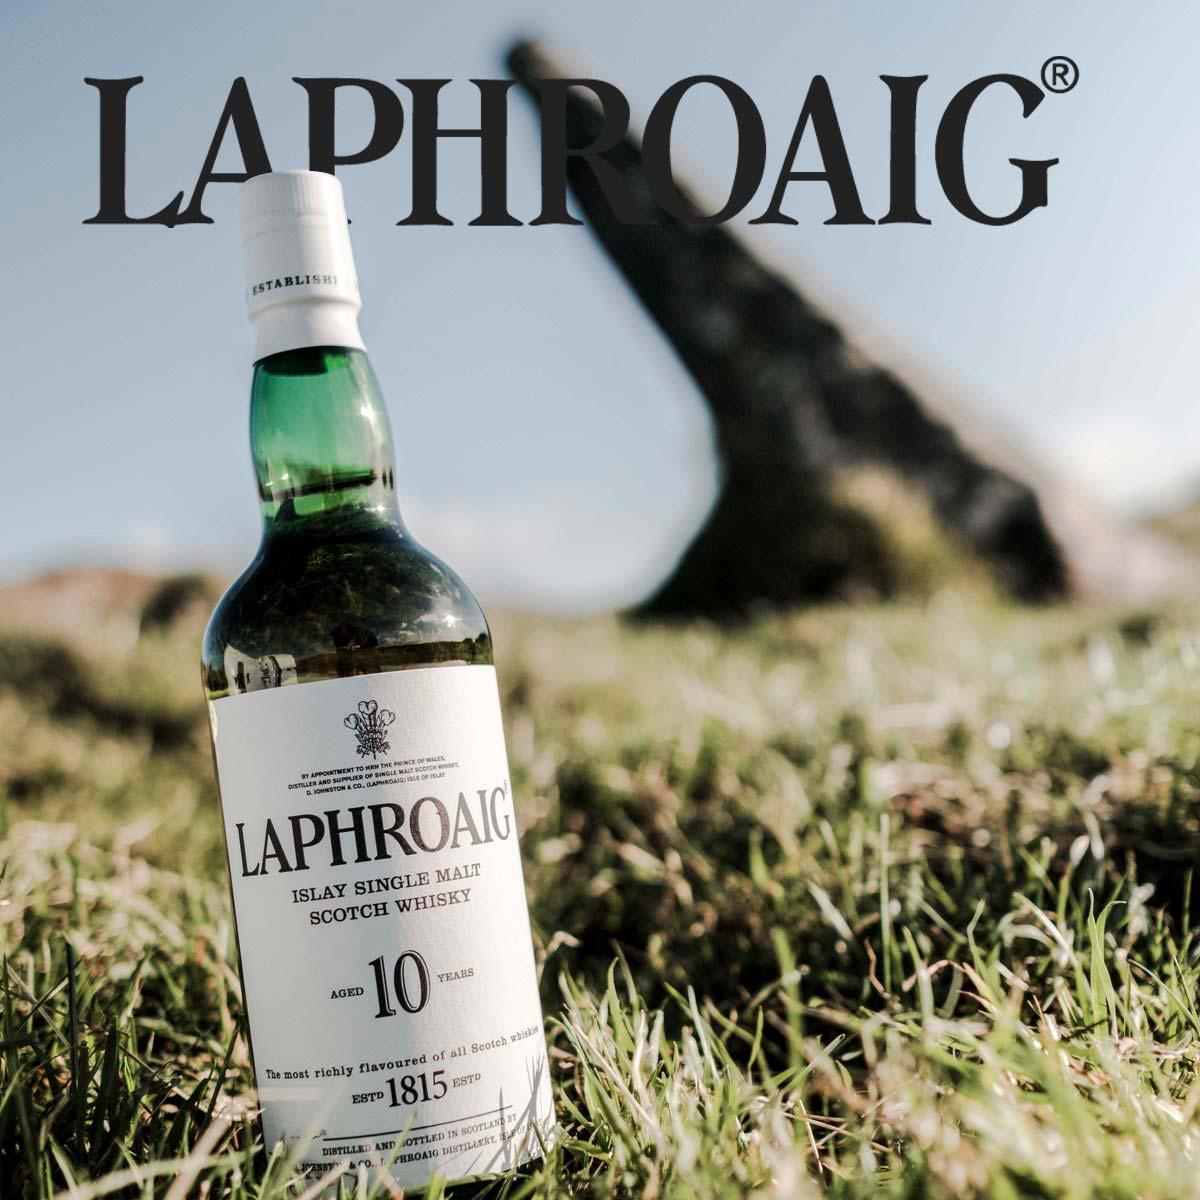 Laphroaig Tasting Experience   WineDeals.com